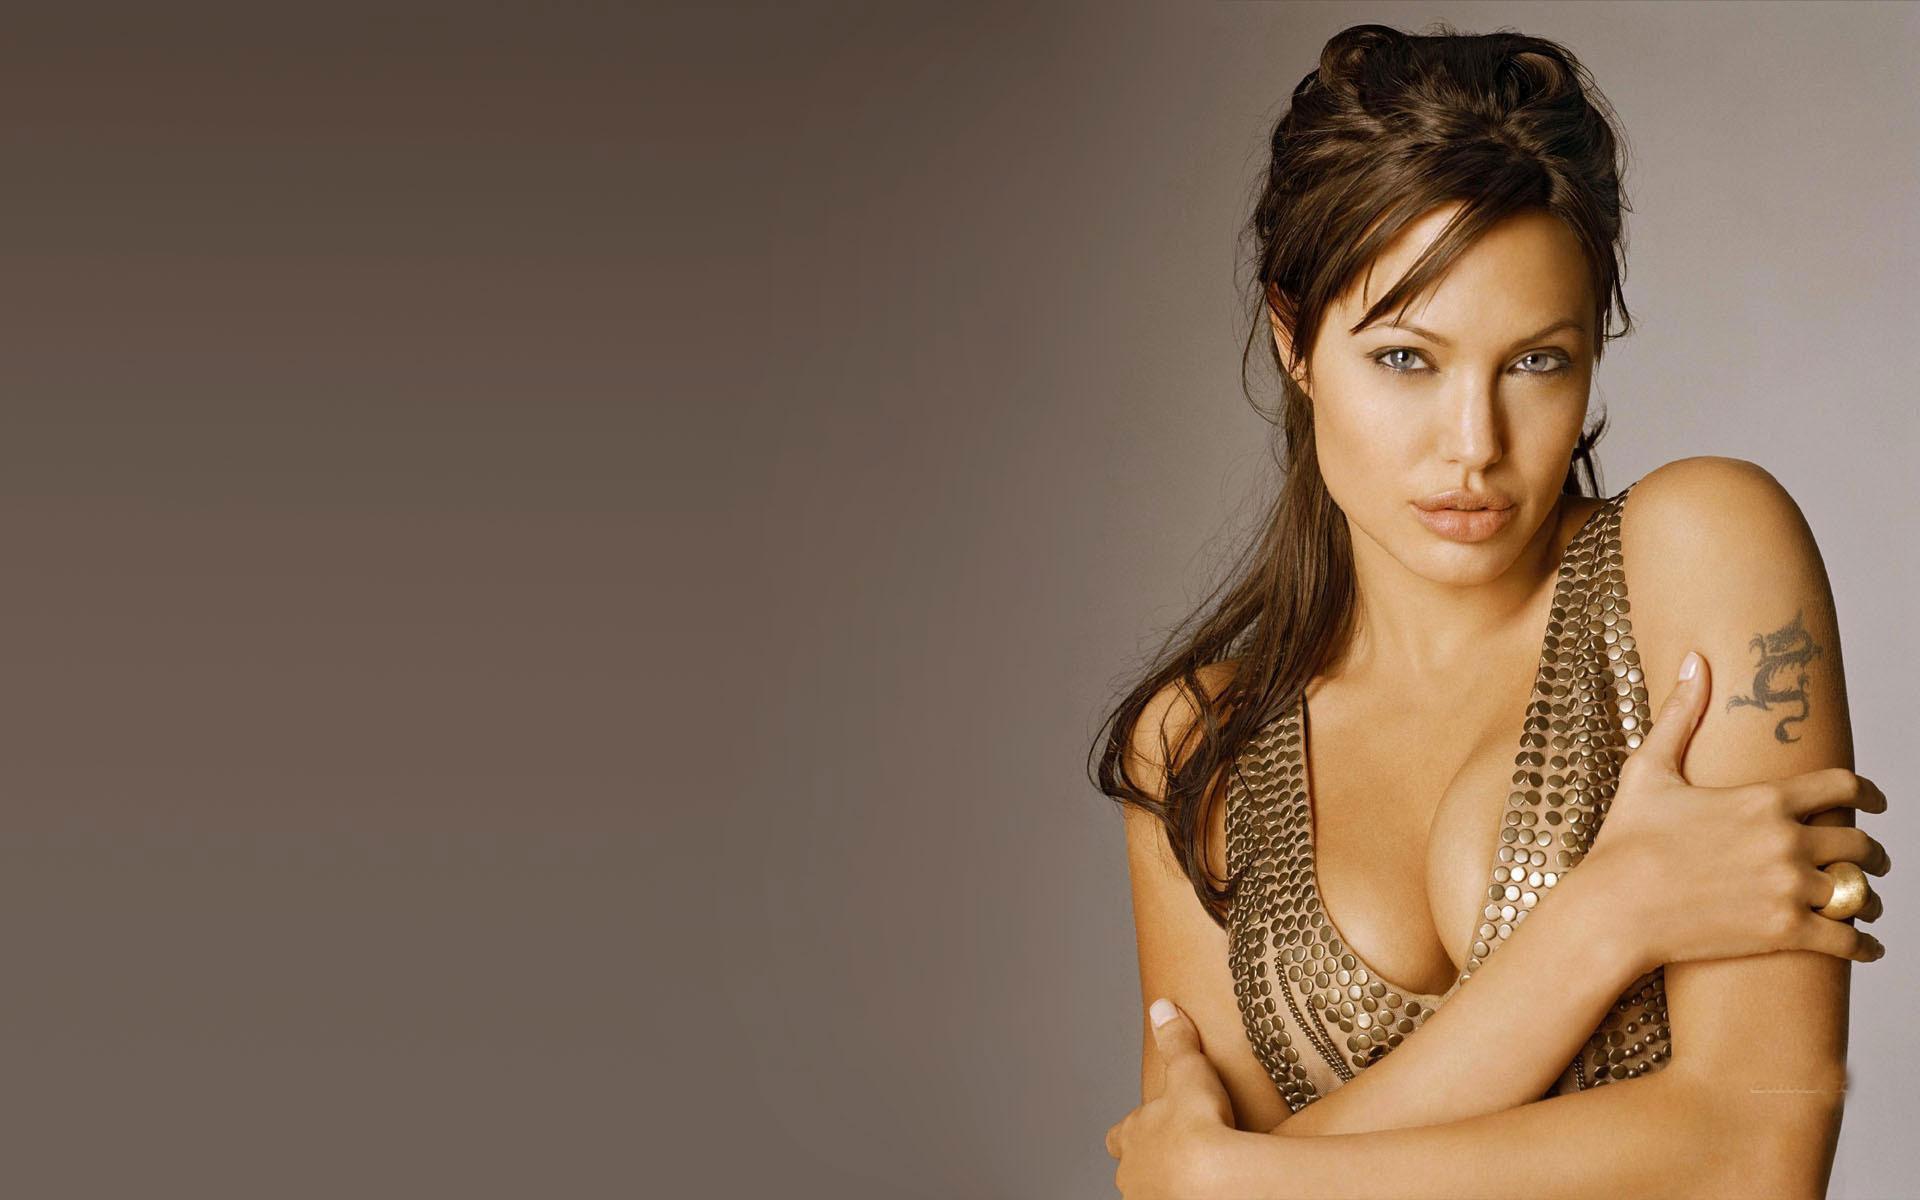 Angelina jolie glamour photos